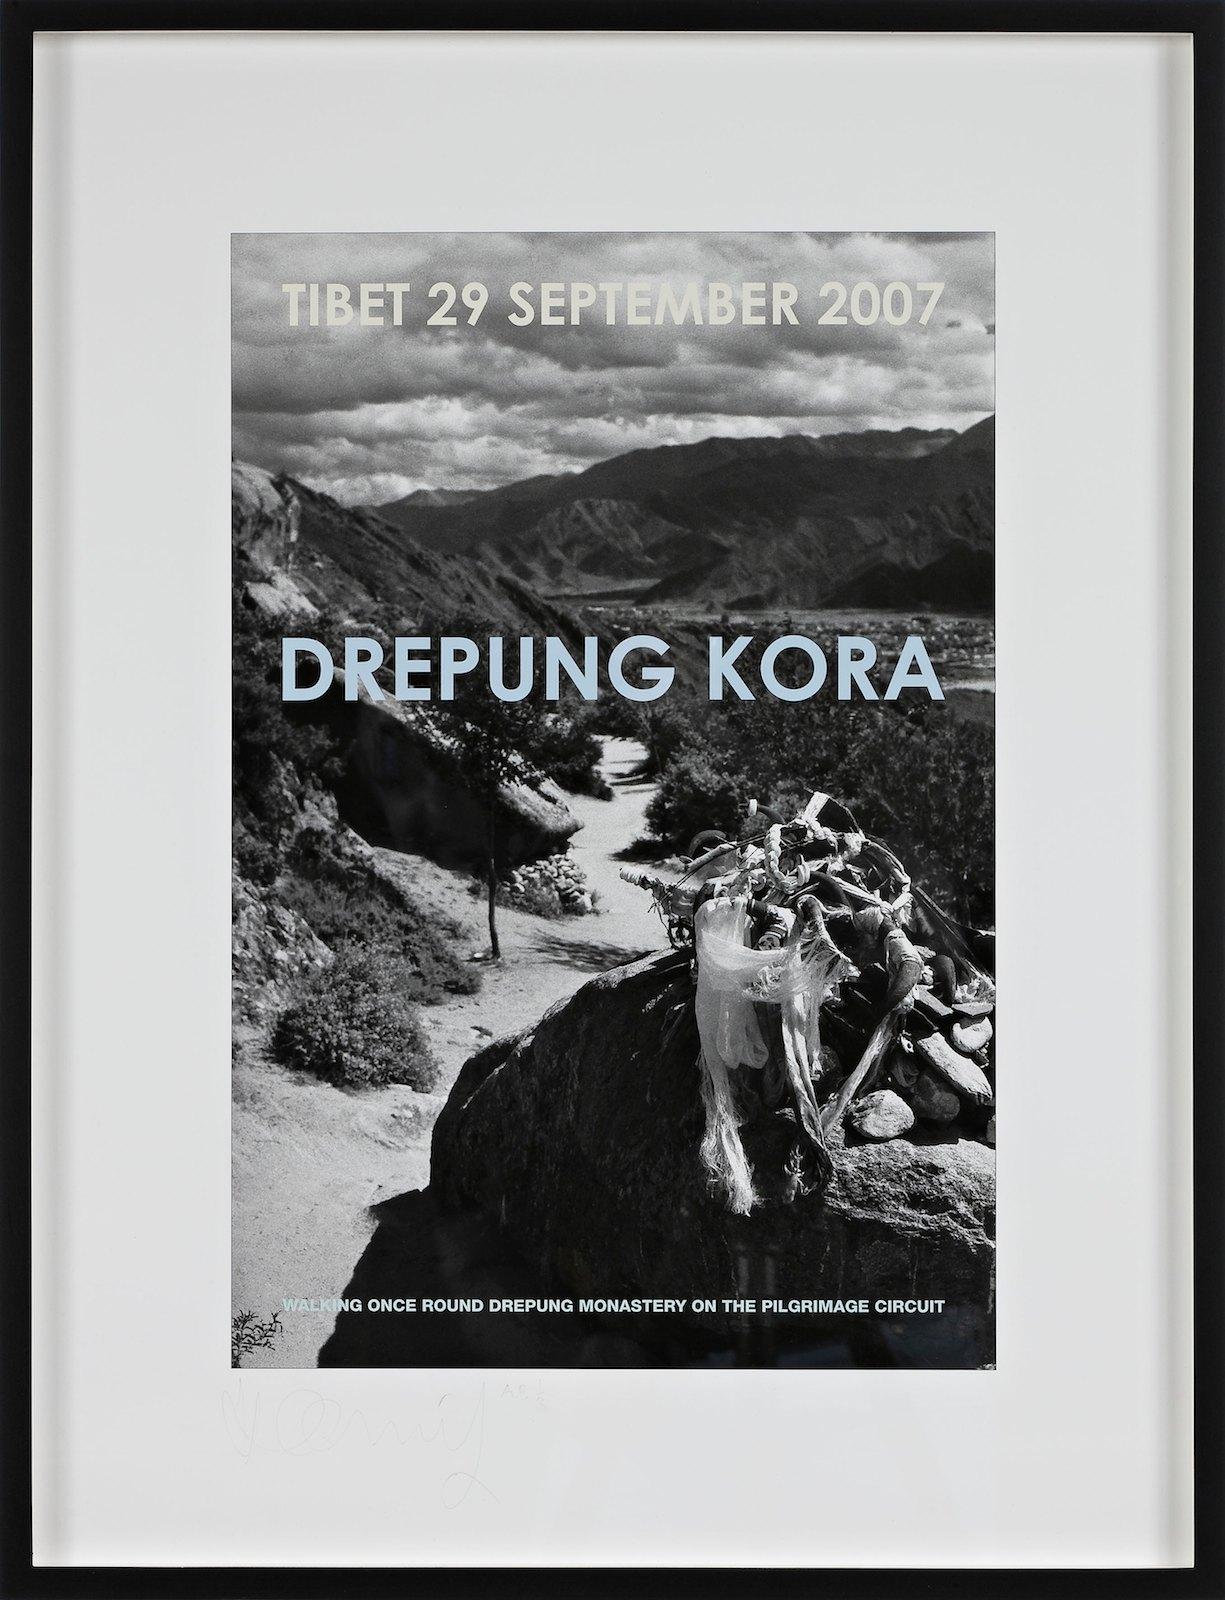 Drepung Kora, 2007, iris print, 45 x 30 cm